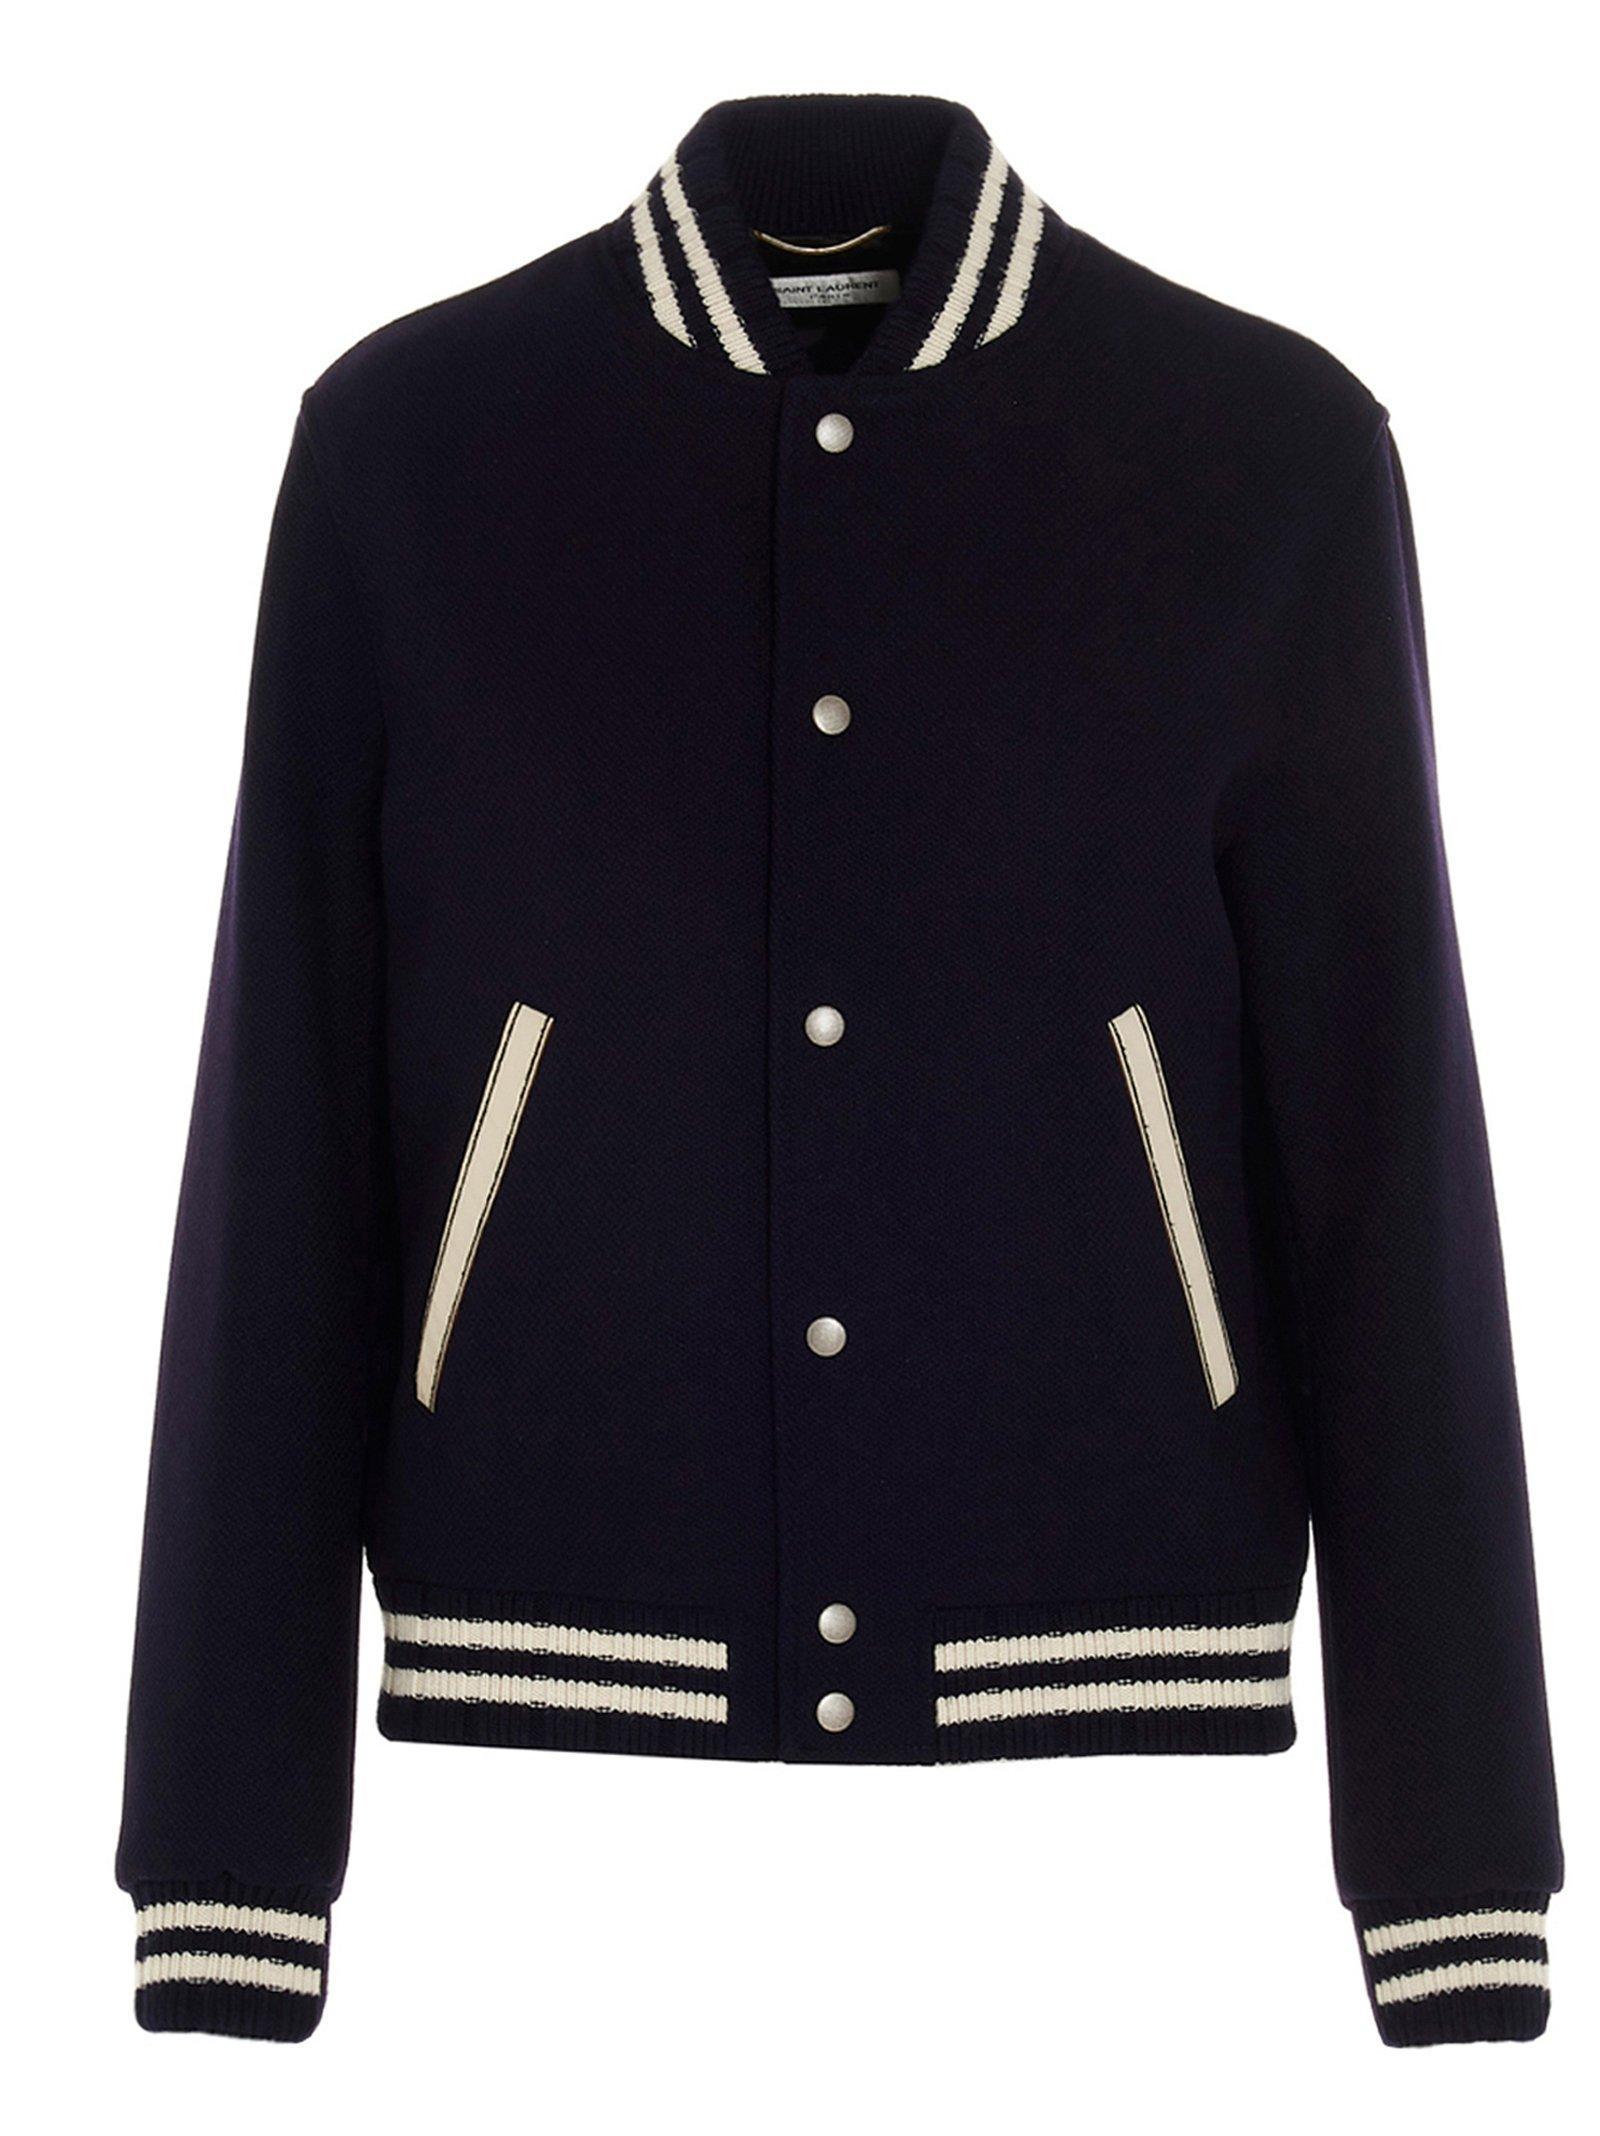 Details about  /Black Wool Real Leather Sleeves Varsity Jacket Rib Black/&White